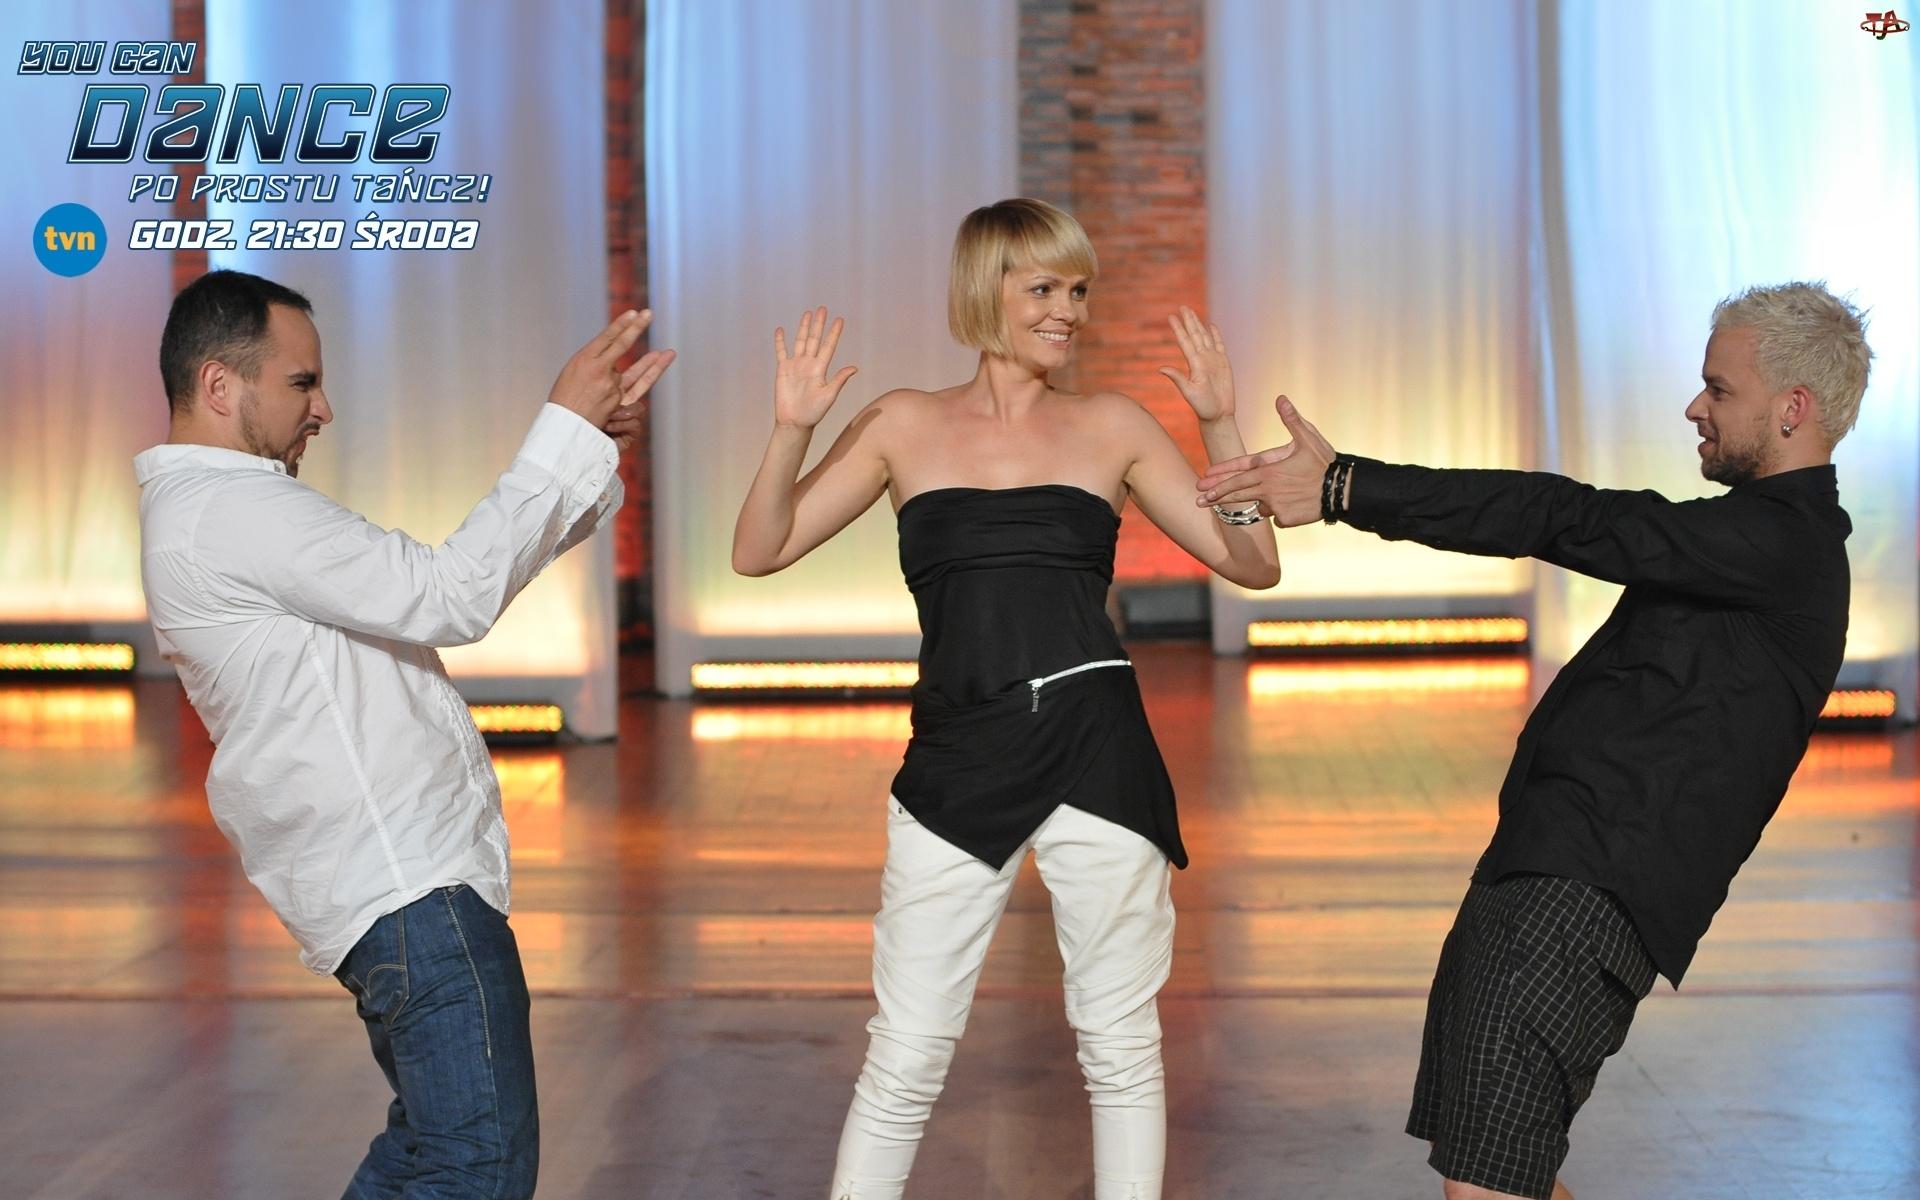 Michał Piróg, You Can Dance, Agustin Egurrola, Weronika Marczuk